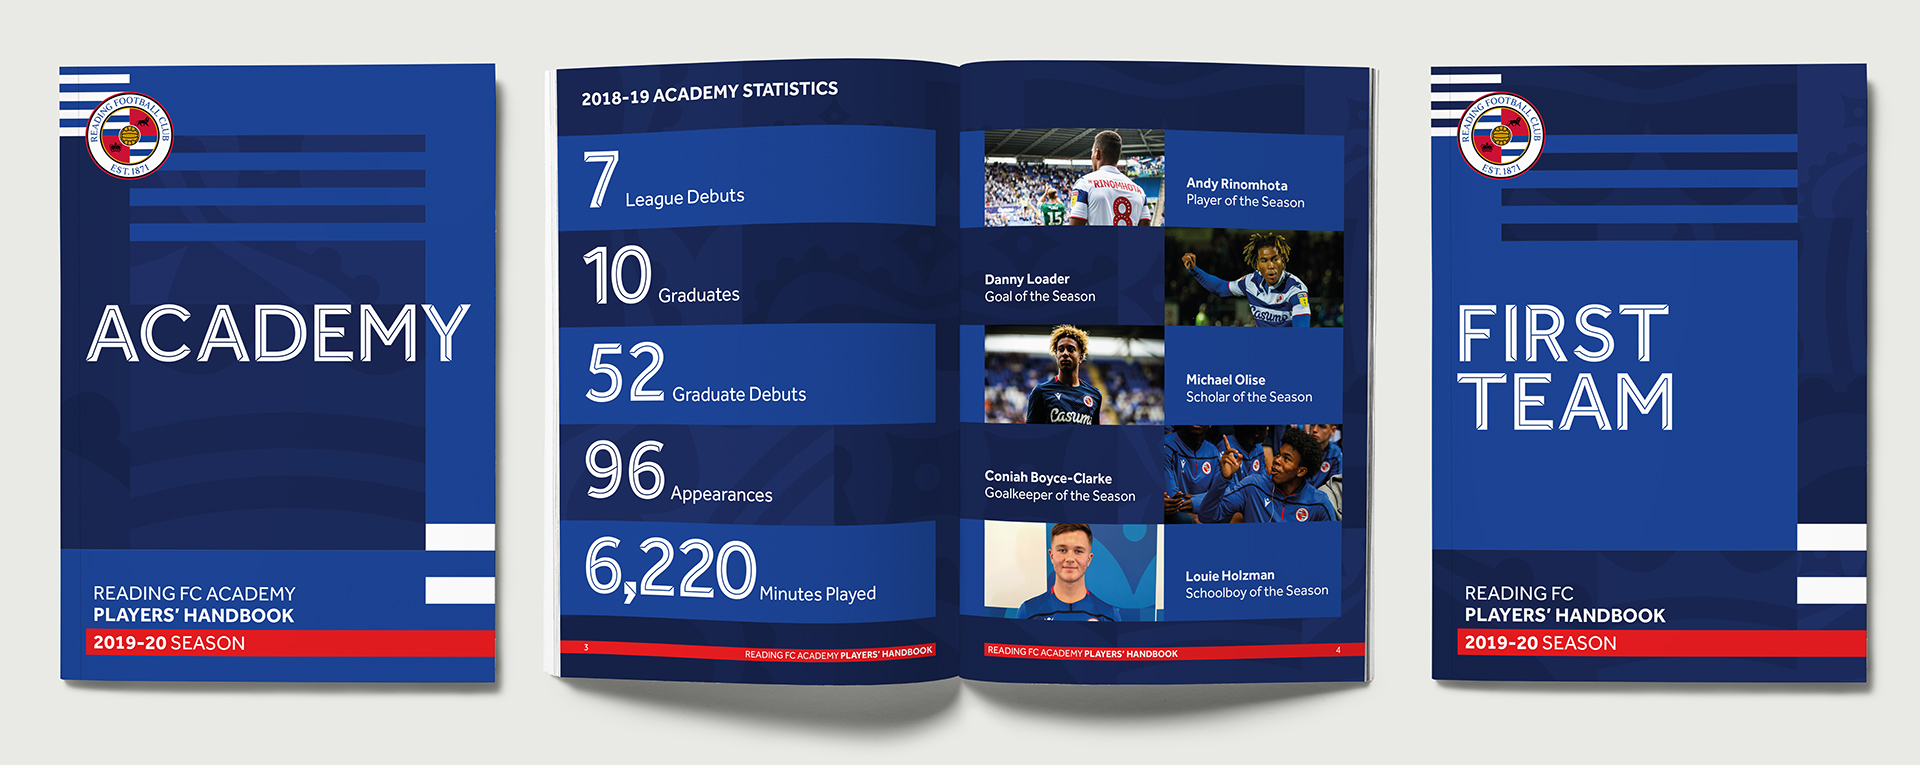 RFC Academy and First Team players' handbooks